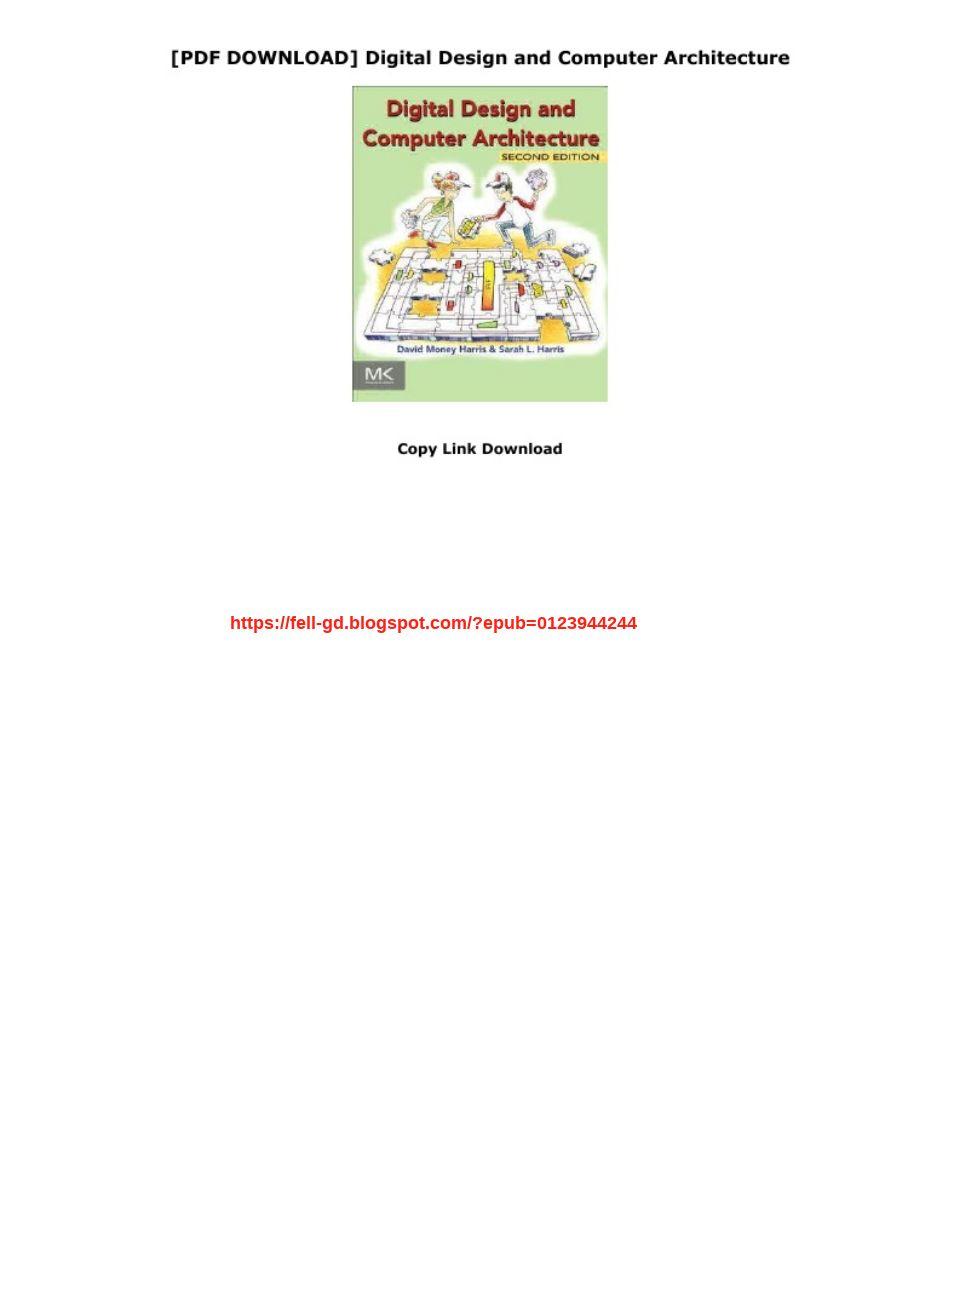 Digital Design And Computer Architecture Pdf Download